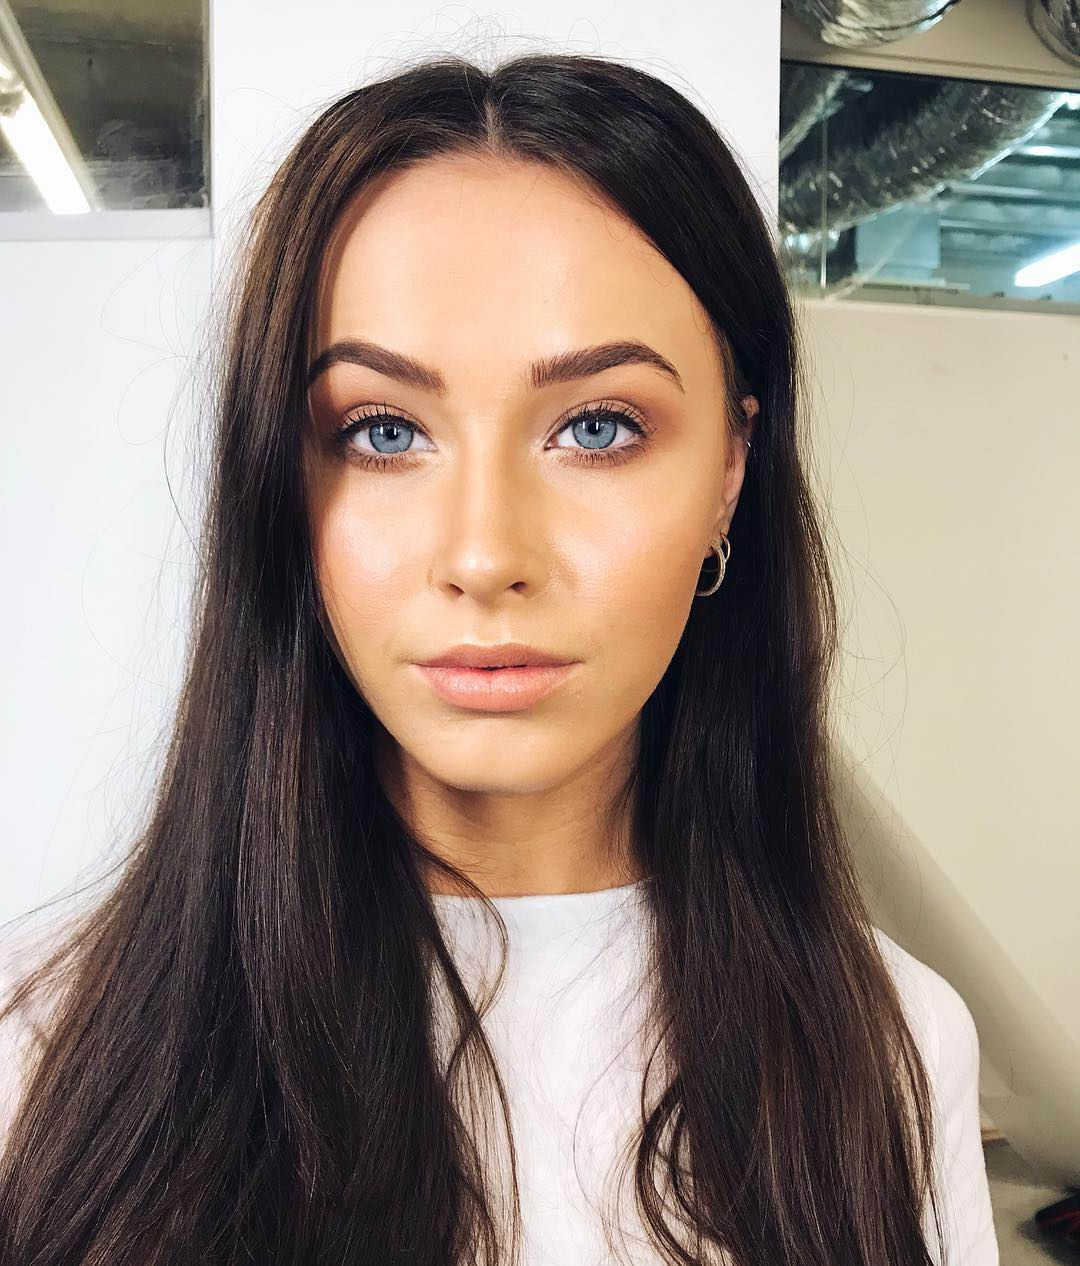 Model Claire